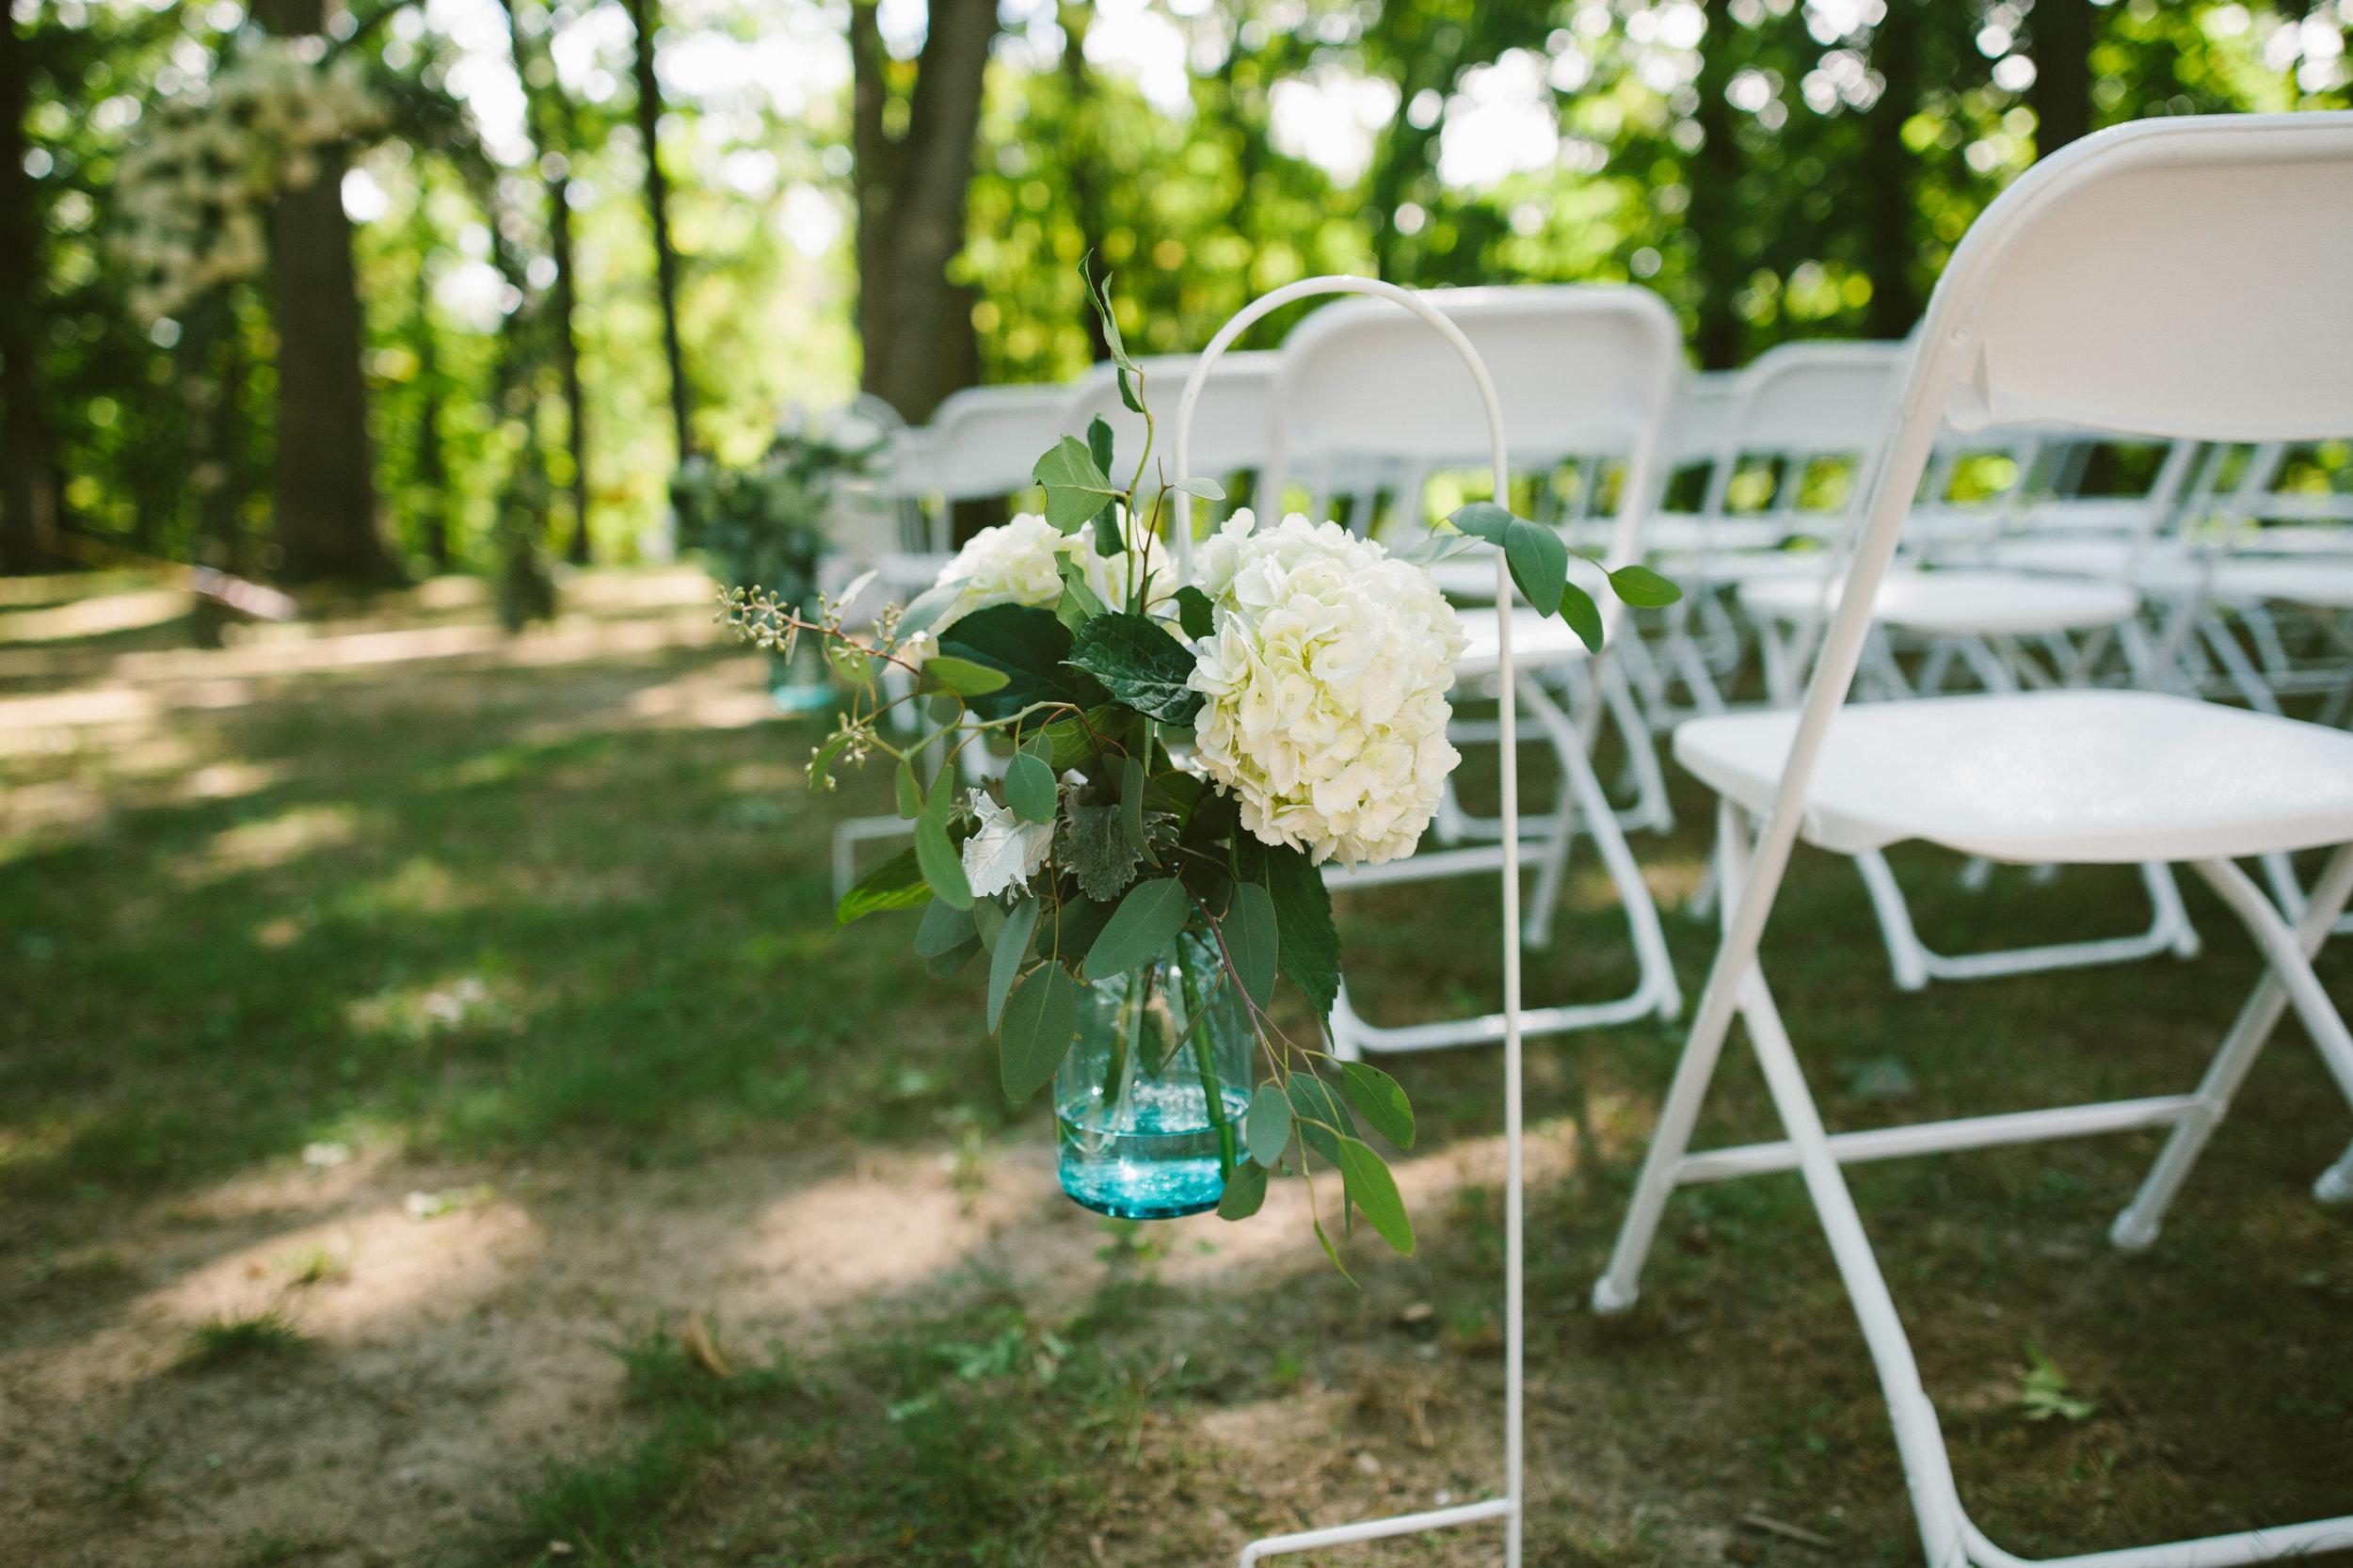 grand_rapids_wedding_rockford_wedding_richard_app_gallery_wedding_grand_rapids_wedding_photographer_summer_wedding_wabasis_lake_park_wedding_rustic_wedding-18.jpg